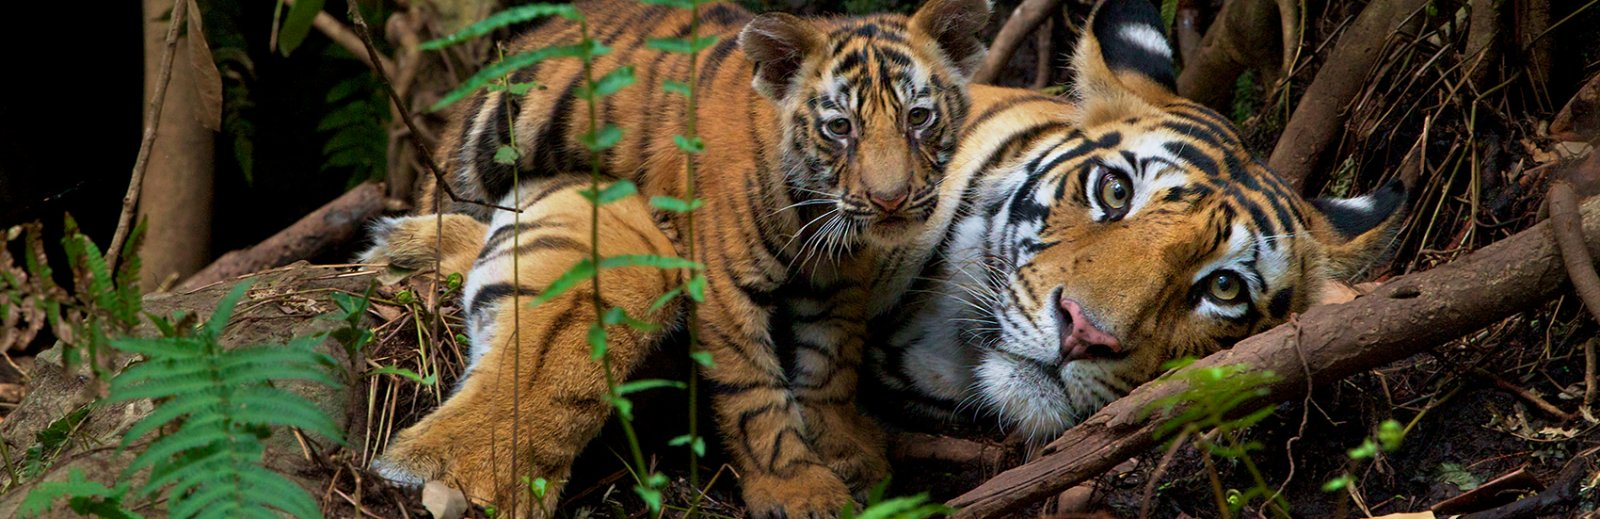 Name:  Tigers-Wide_1700x550.jpg Views: 61 Size:  212.1 KB